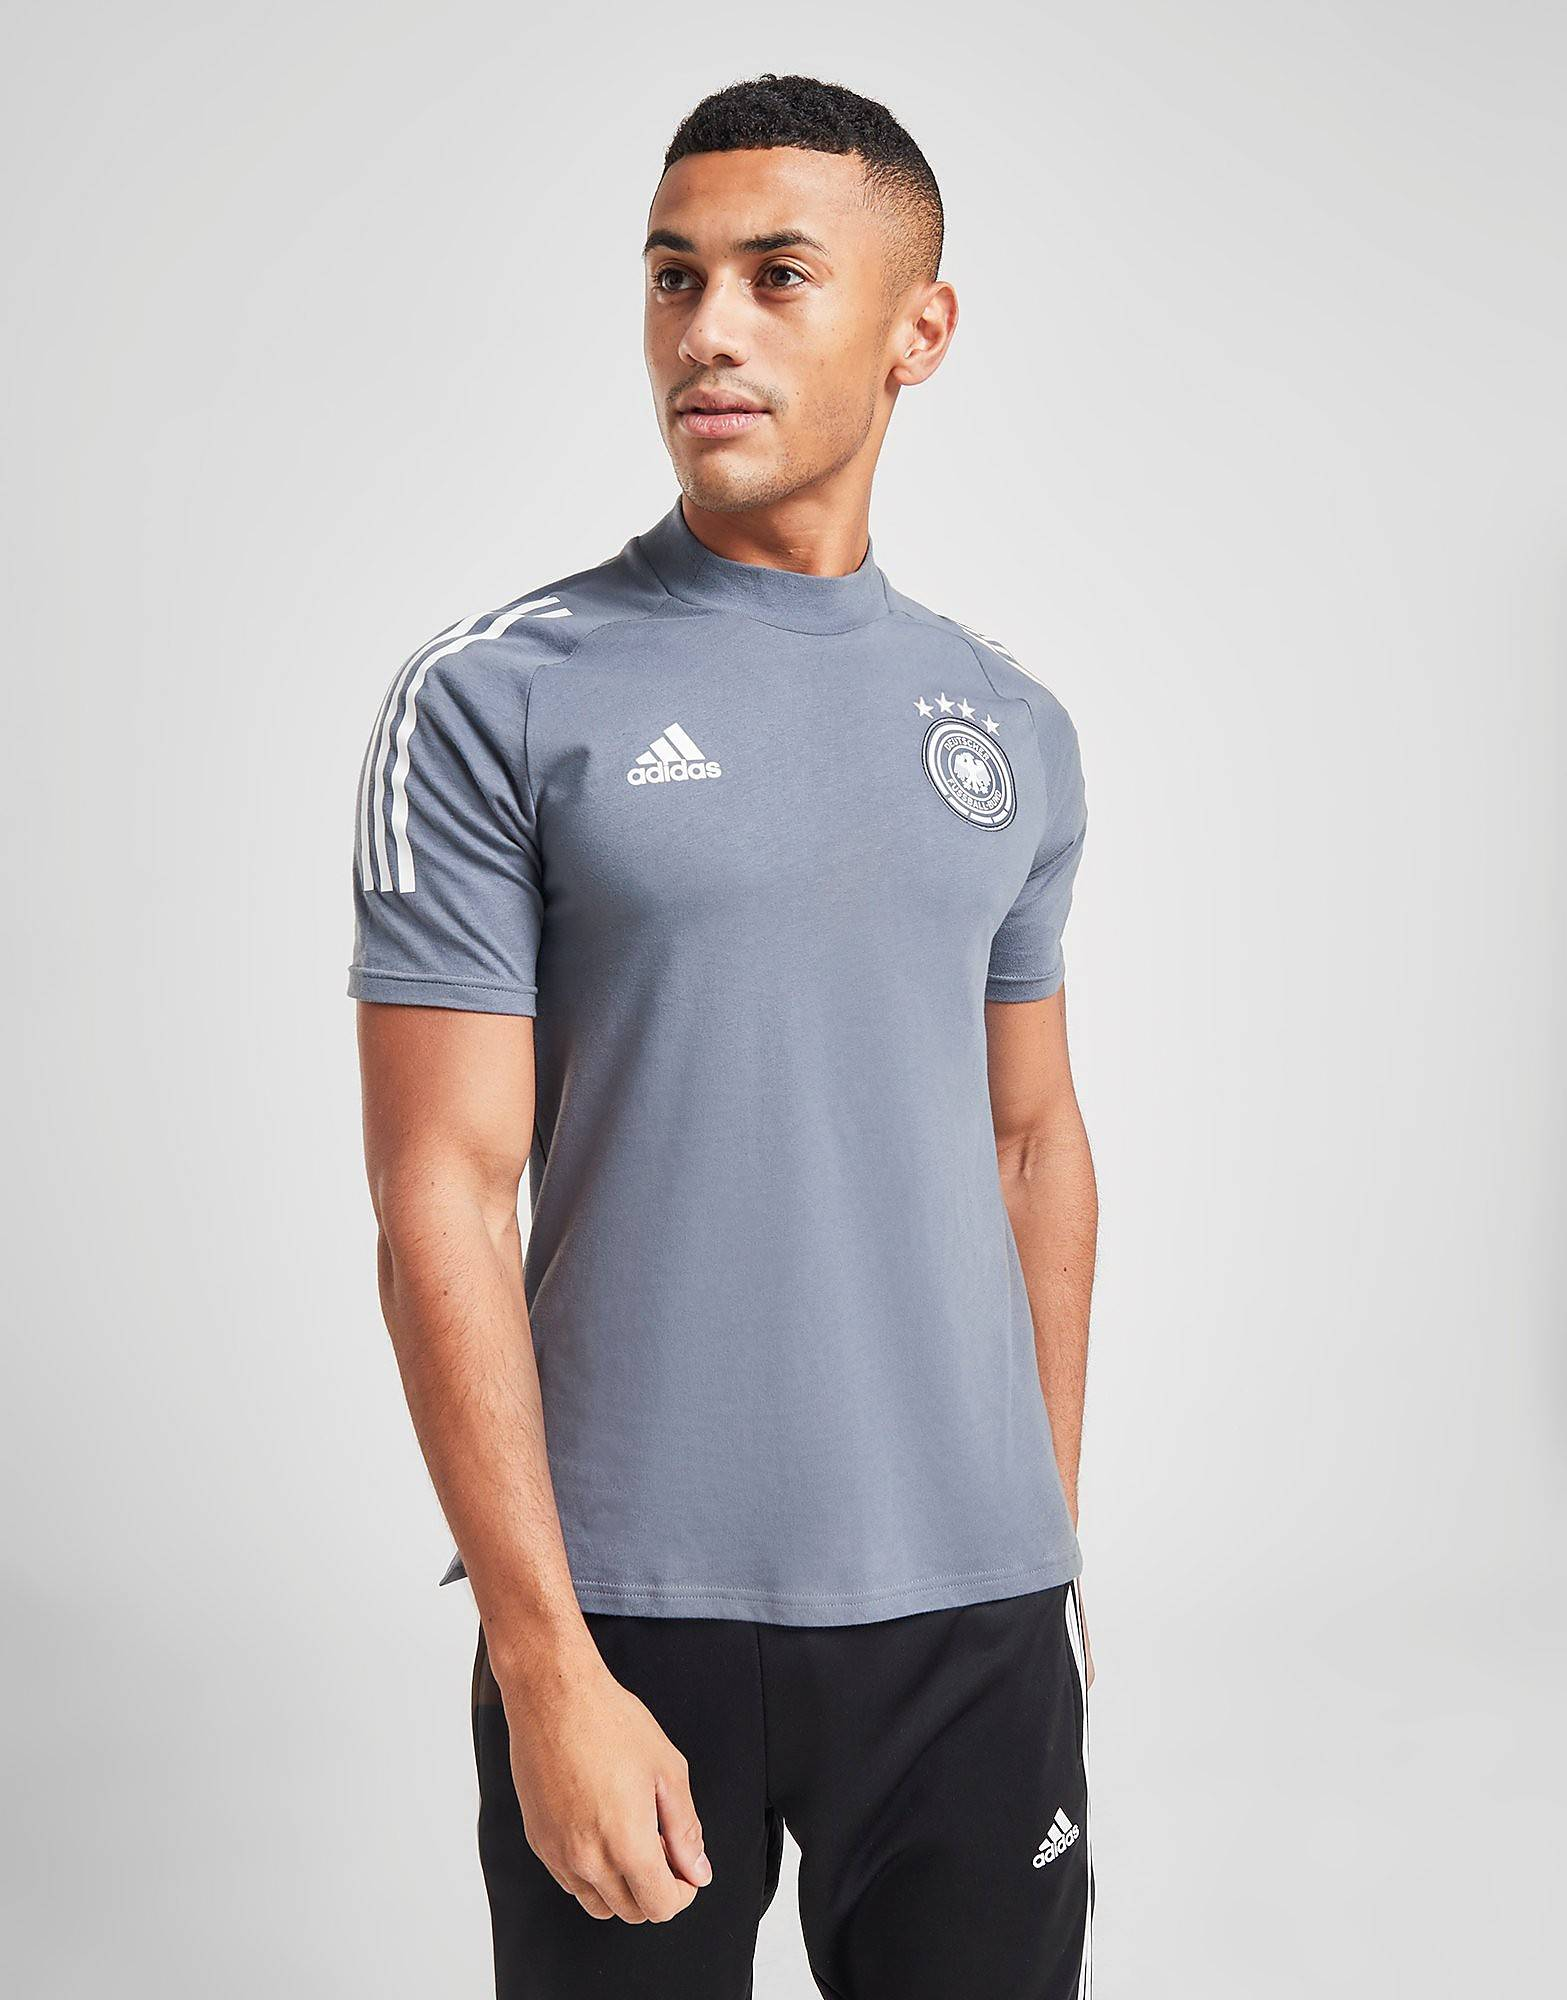 Image of Adidas Germany T-paita Miehet - Mens, Harmaa